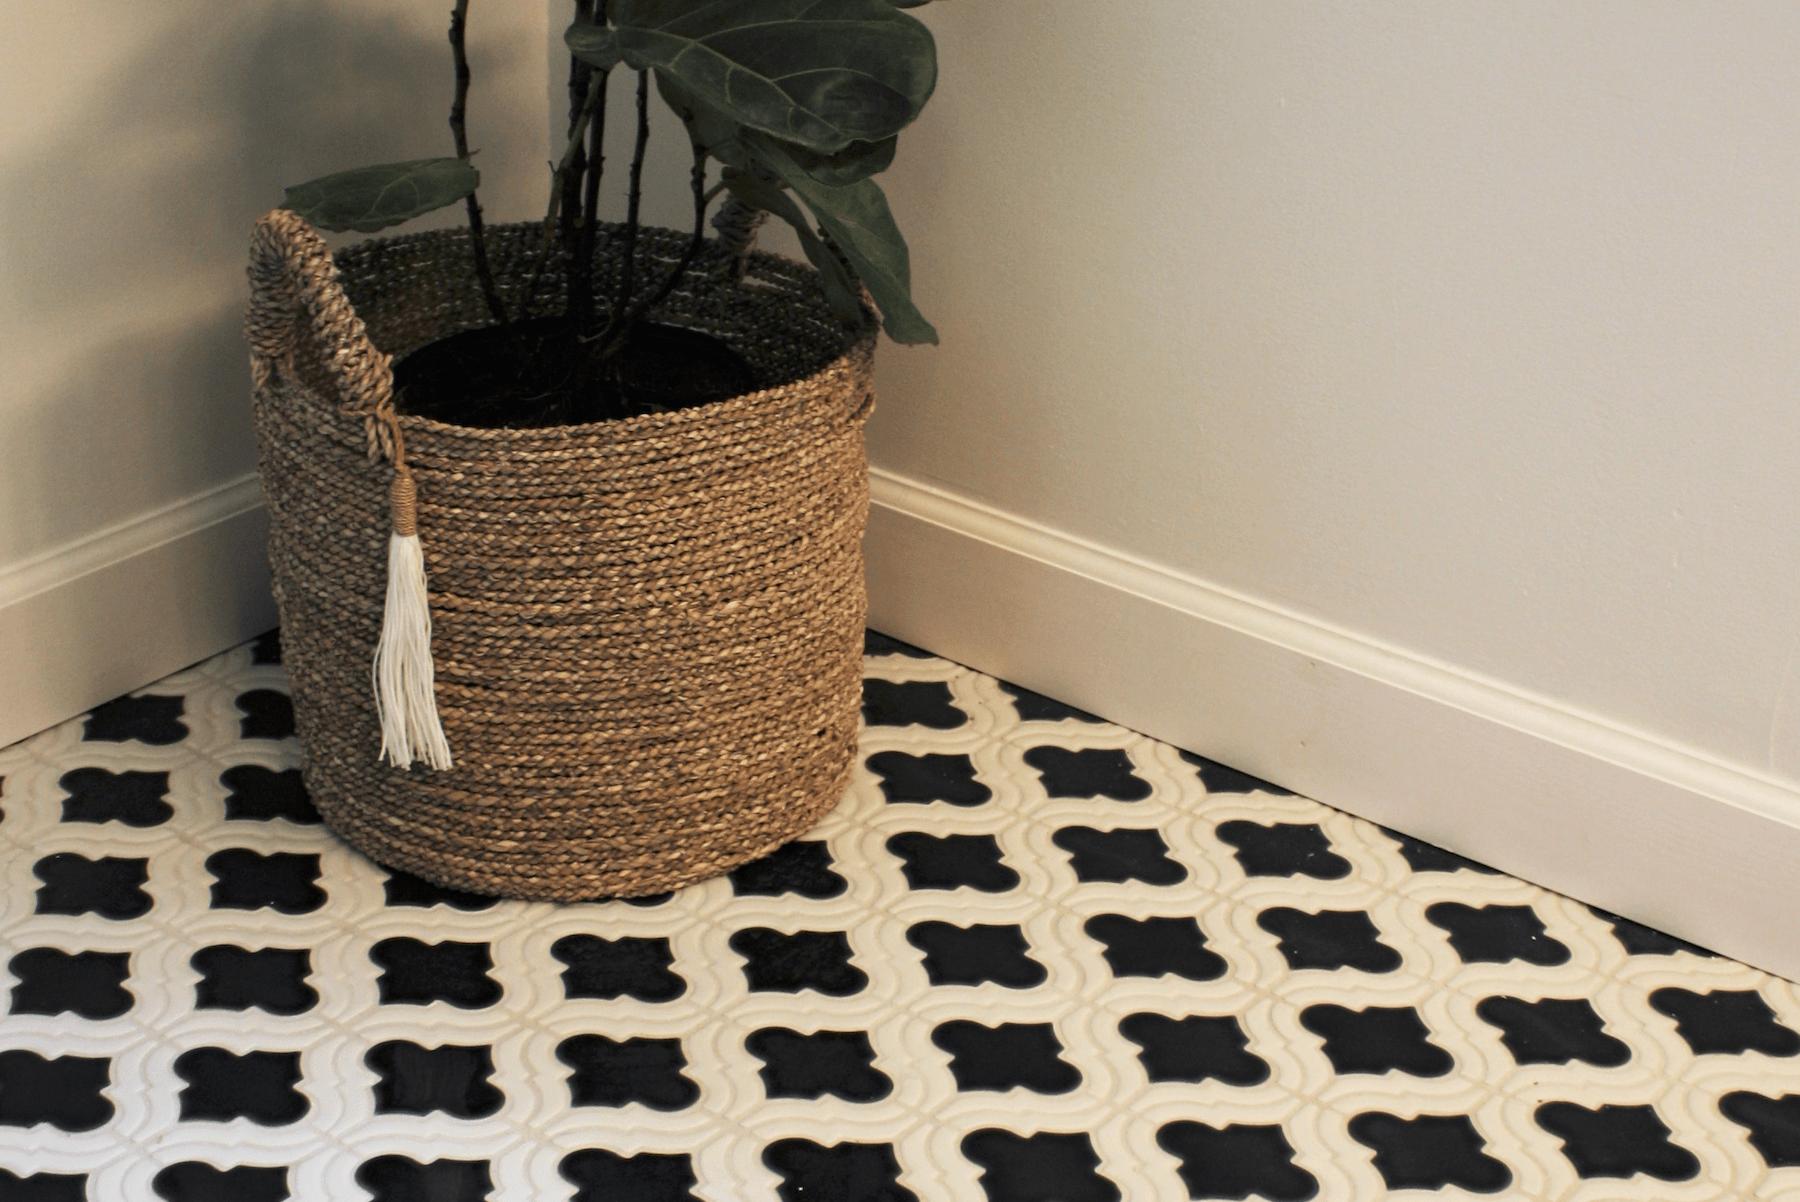 Custom tile backsplash in Mooresville, NC from LITTLE Wood Flooring & Cabinetry